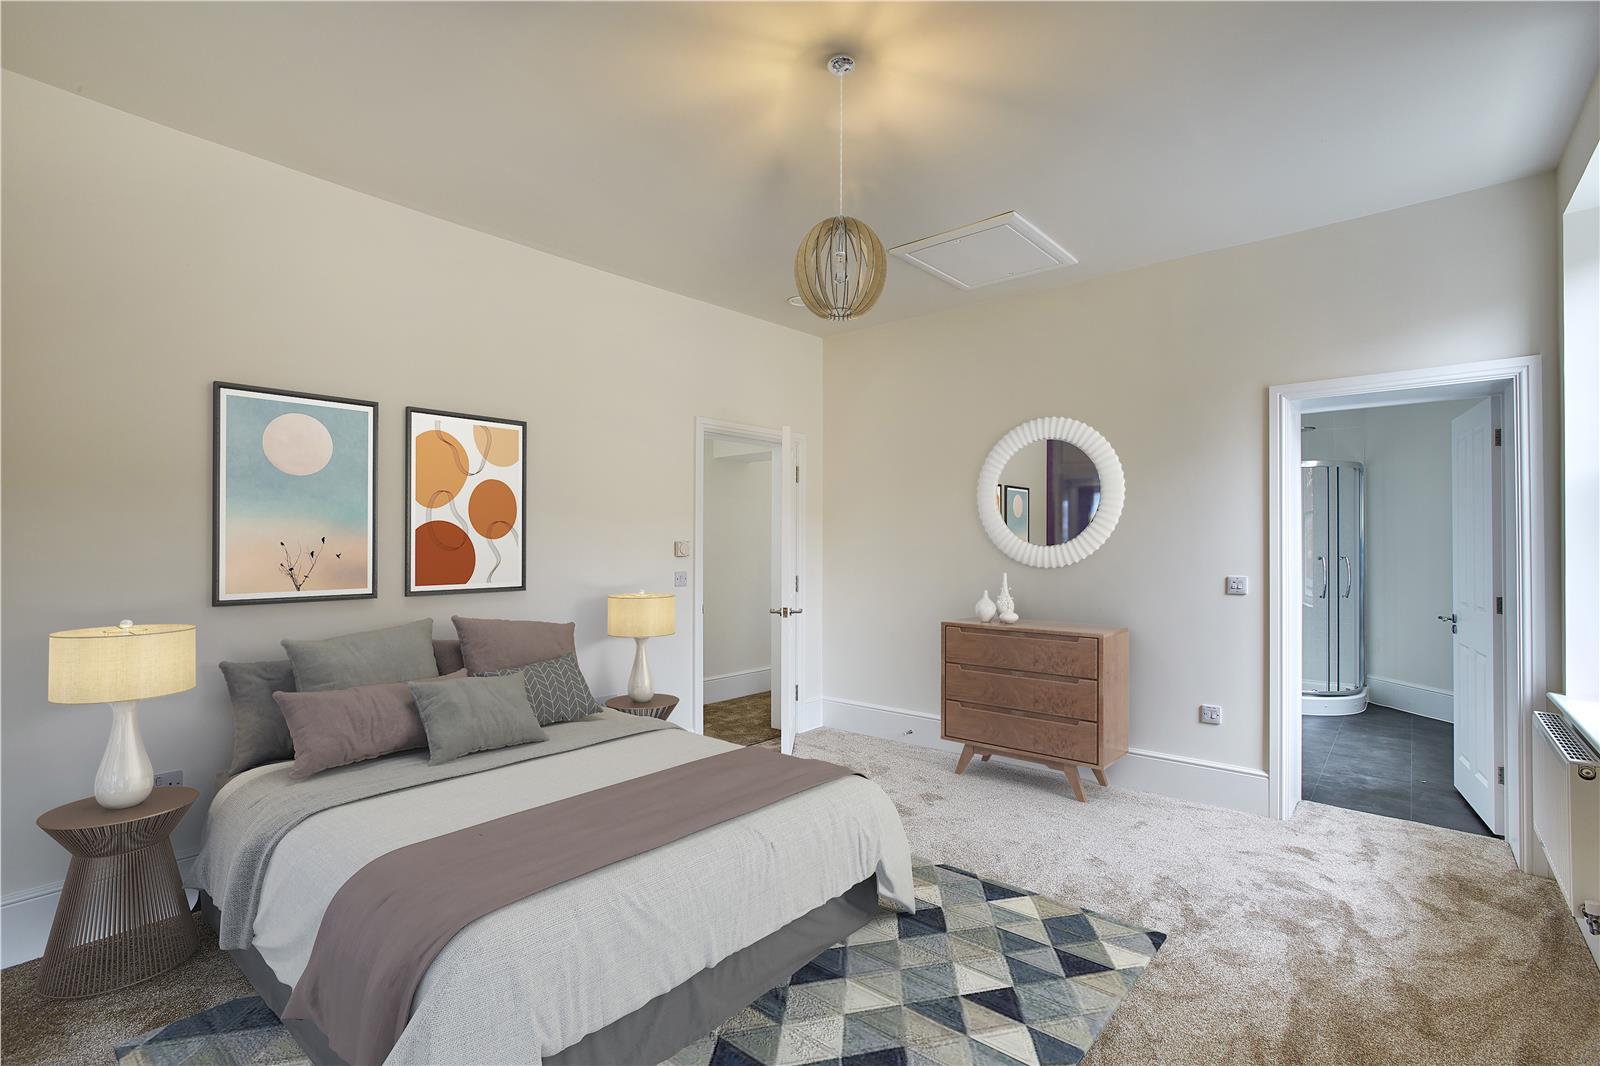 Fair Mile at Cholsey Meadows - bedroom interior